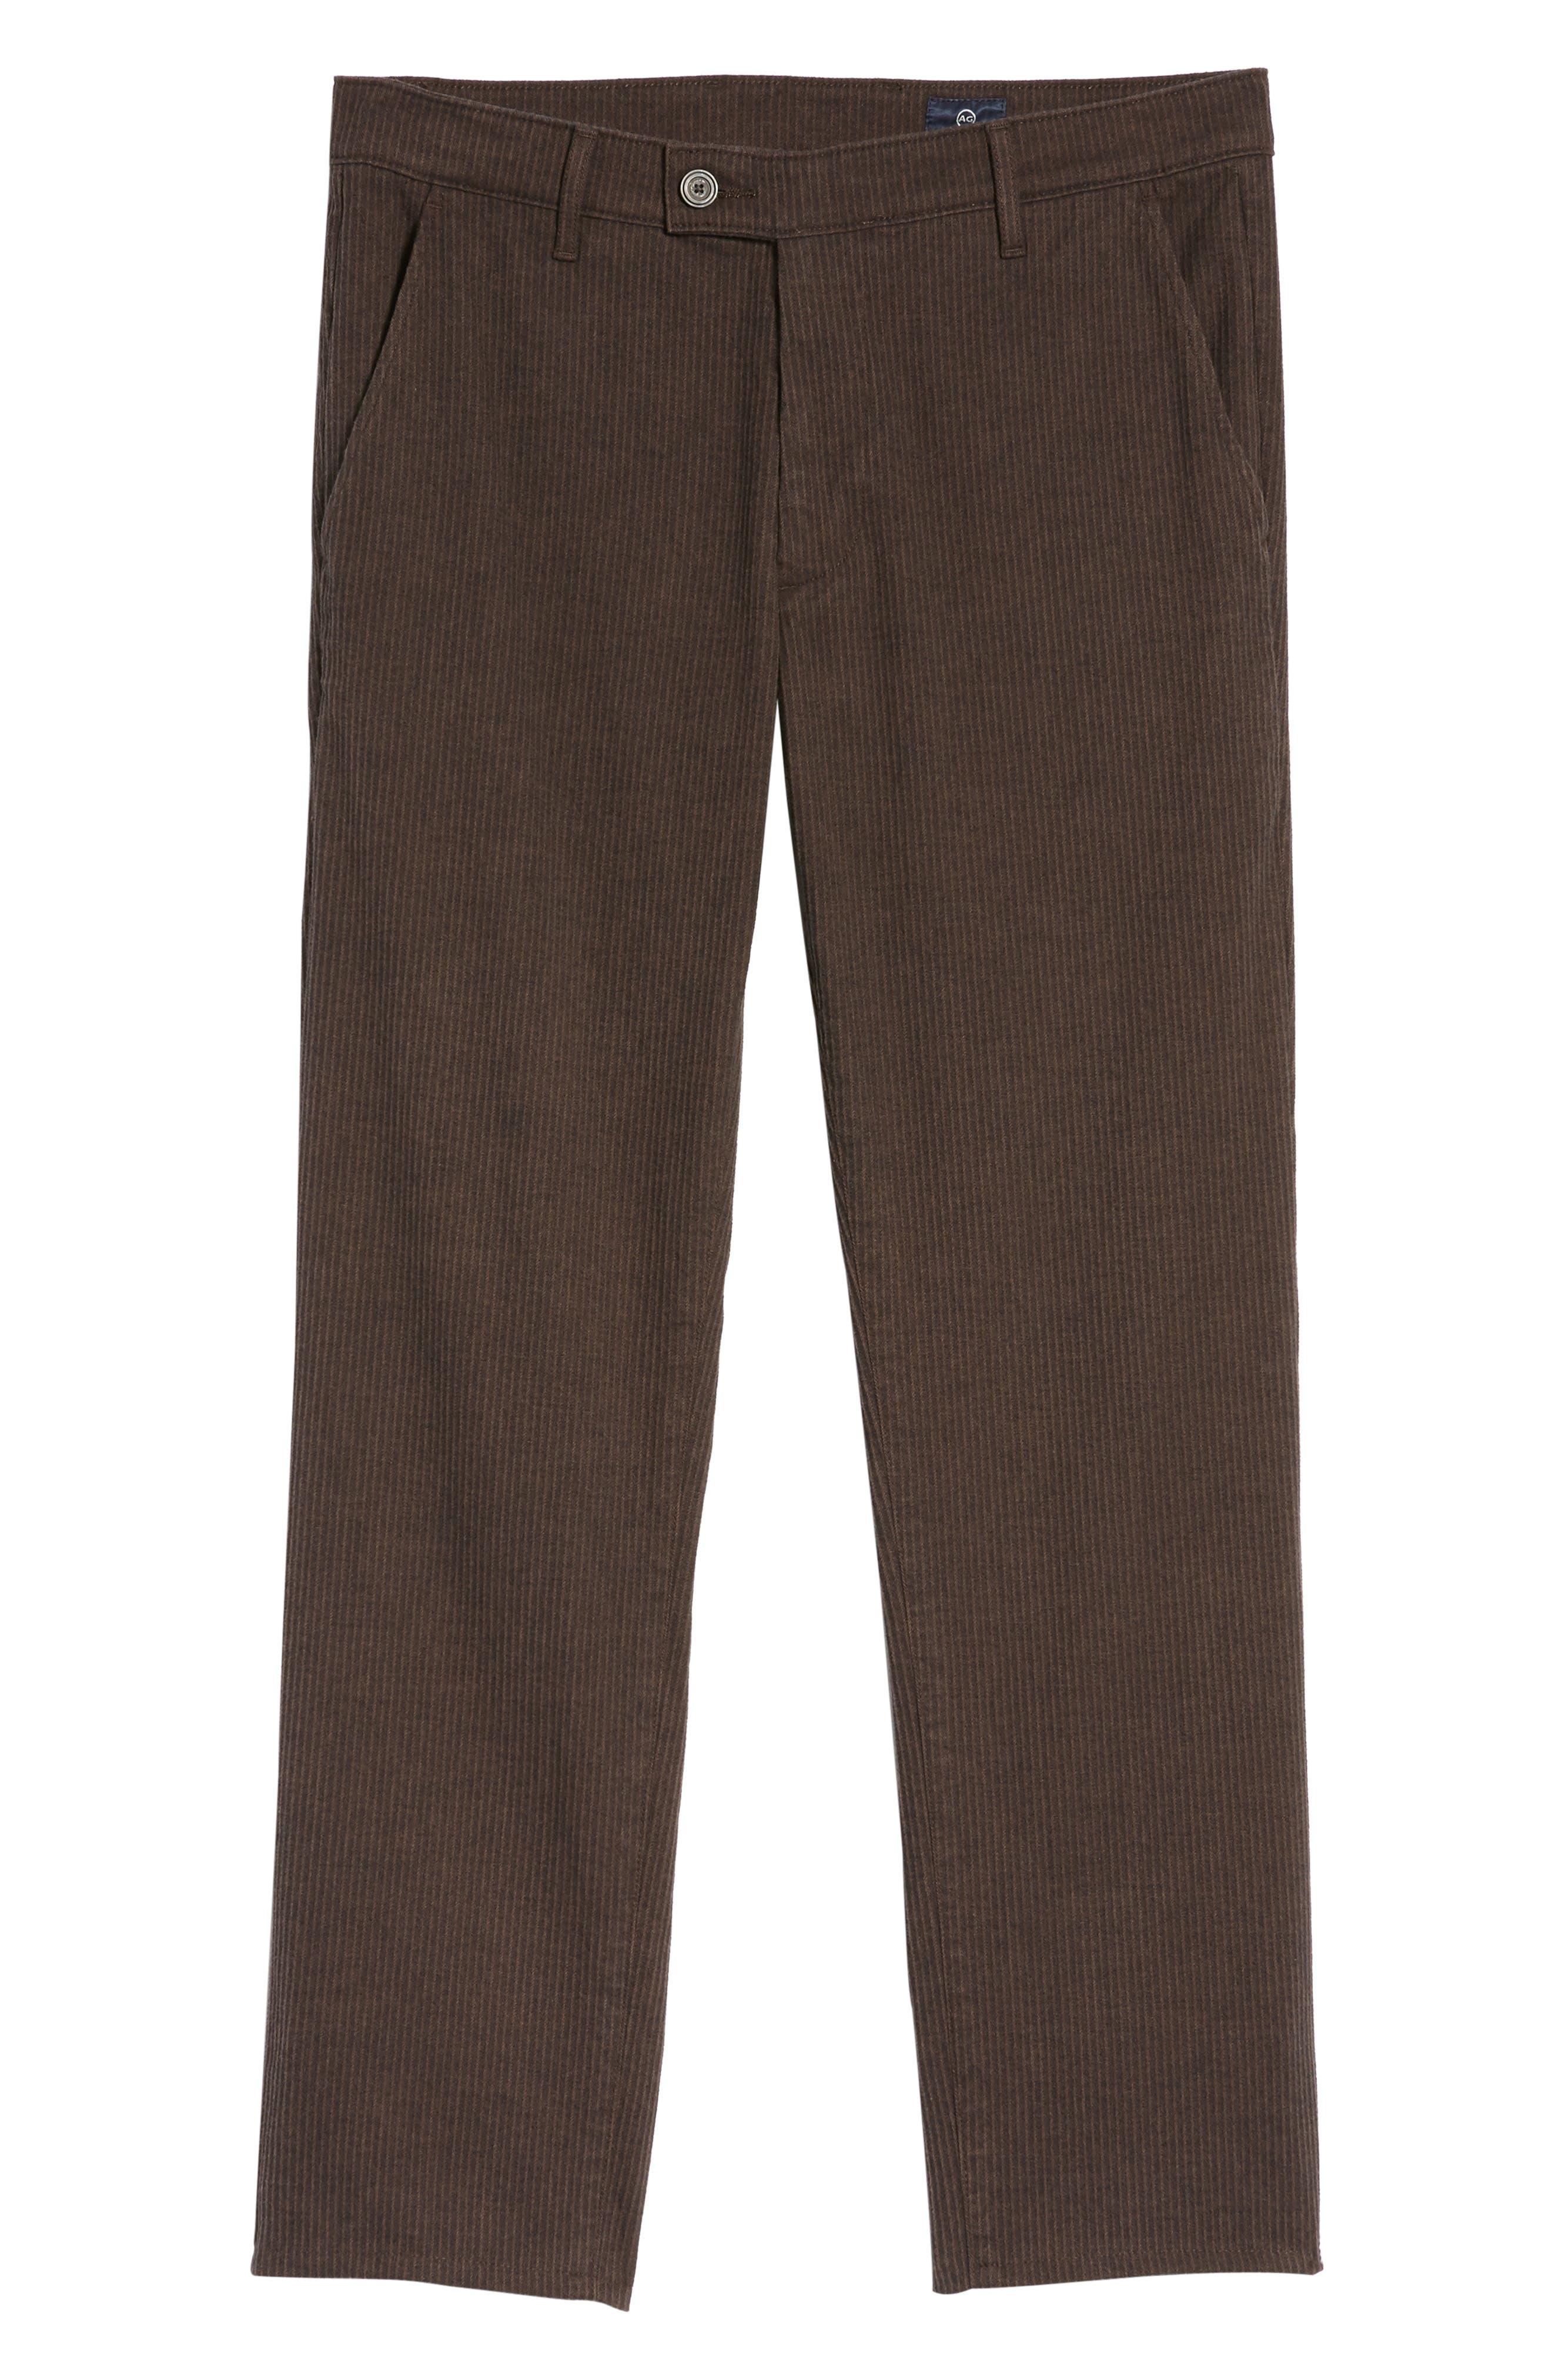 Marshall Slim Fit Pinstripe Pants,                             Alternate thumbnail 5, color,                             Dark Oakwood